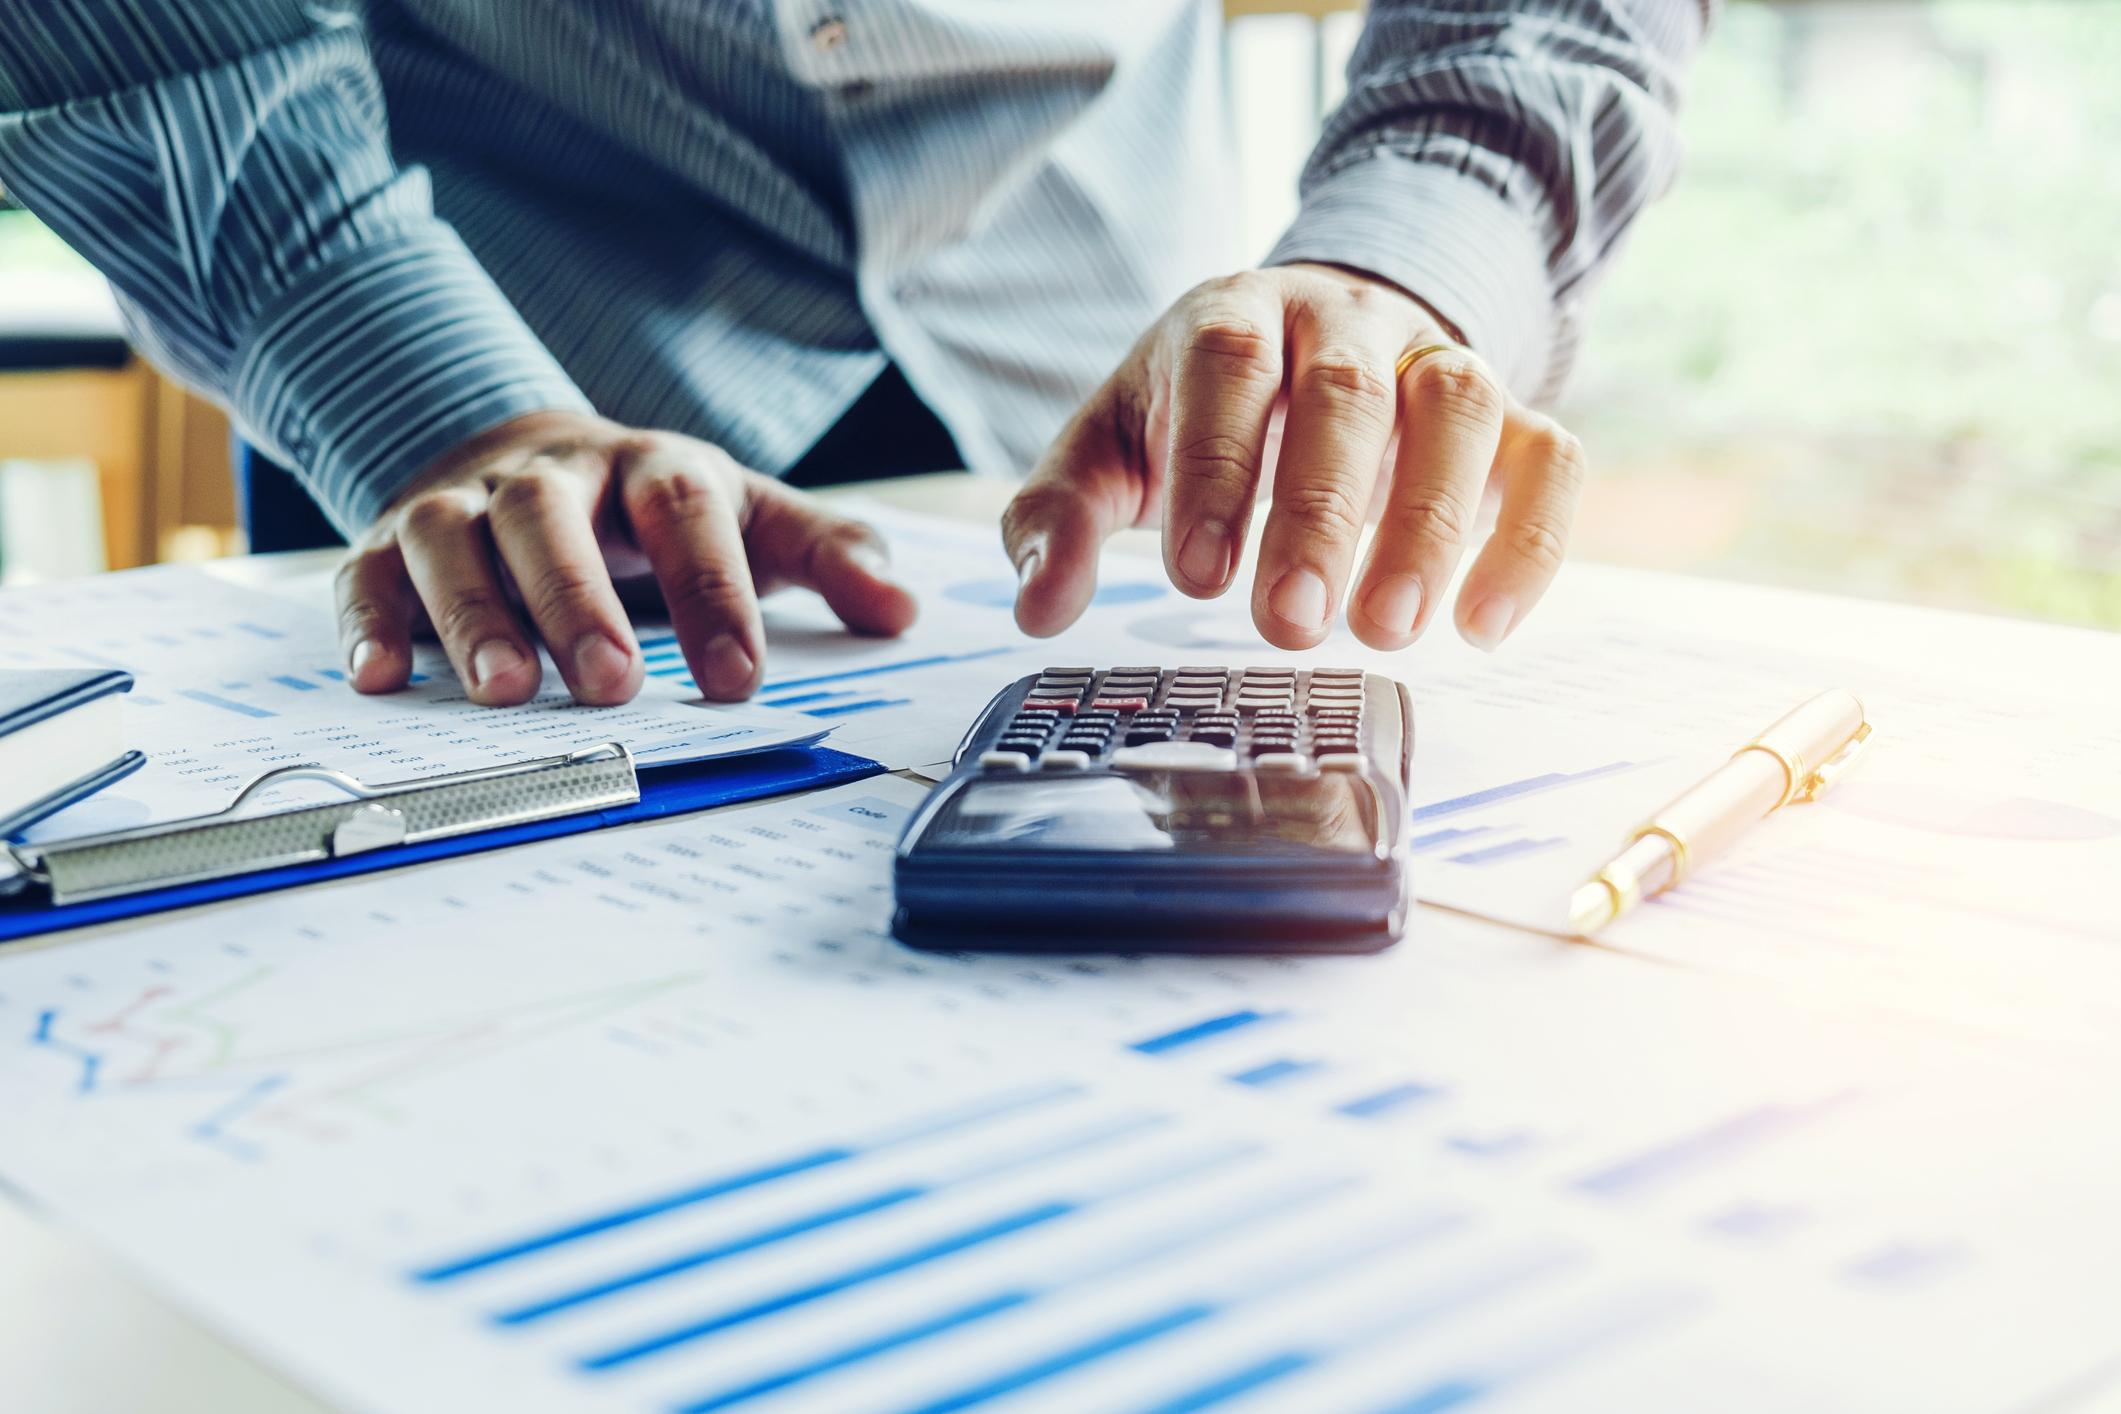 A person calculating financial data.